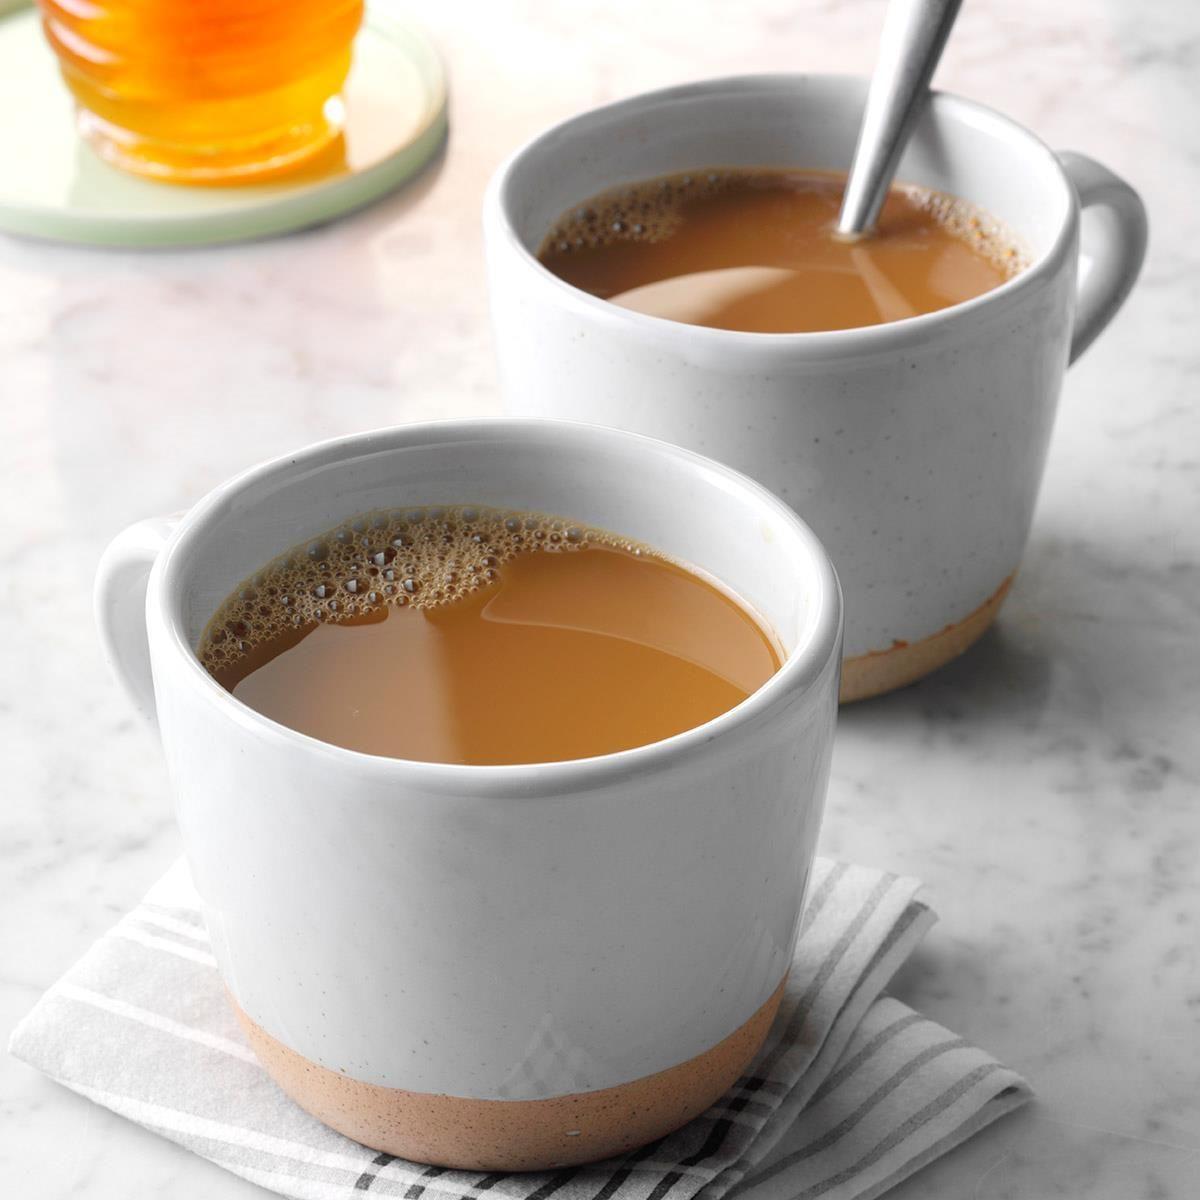 Honey Coffee Recipe: How to Make It | Taste of Home